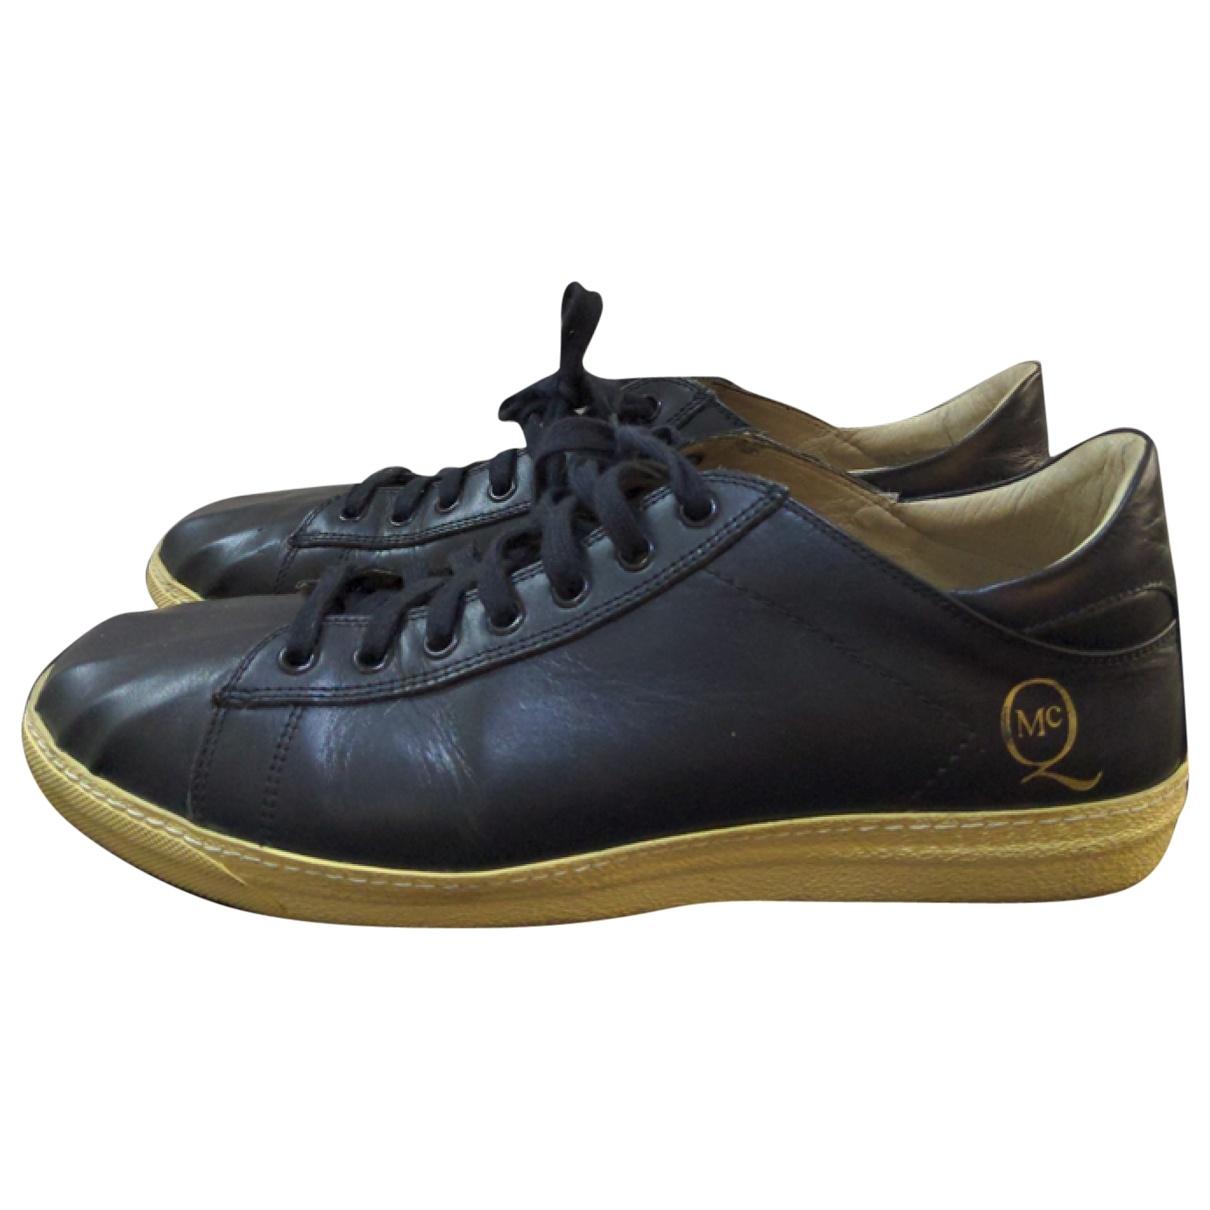 Mcq \N Black Leather Lace ups for Men 42 EU